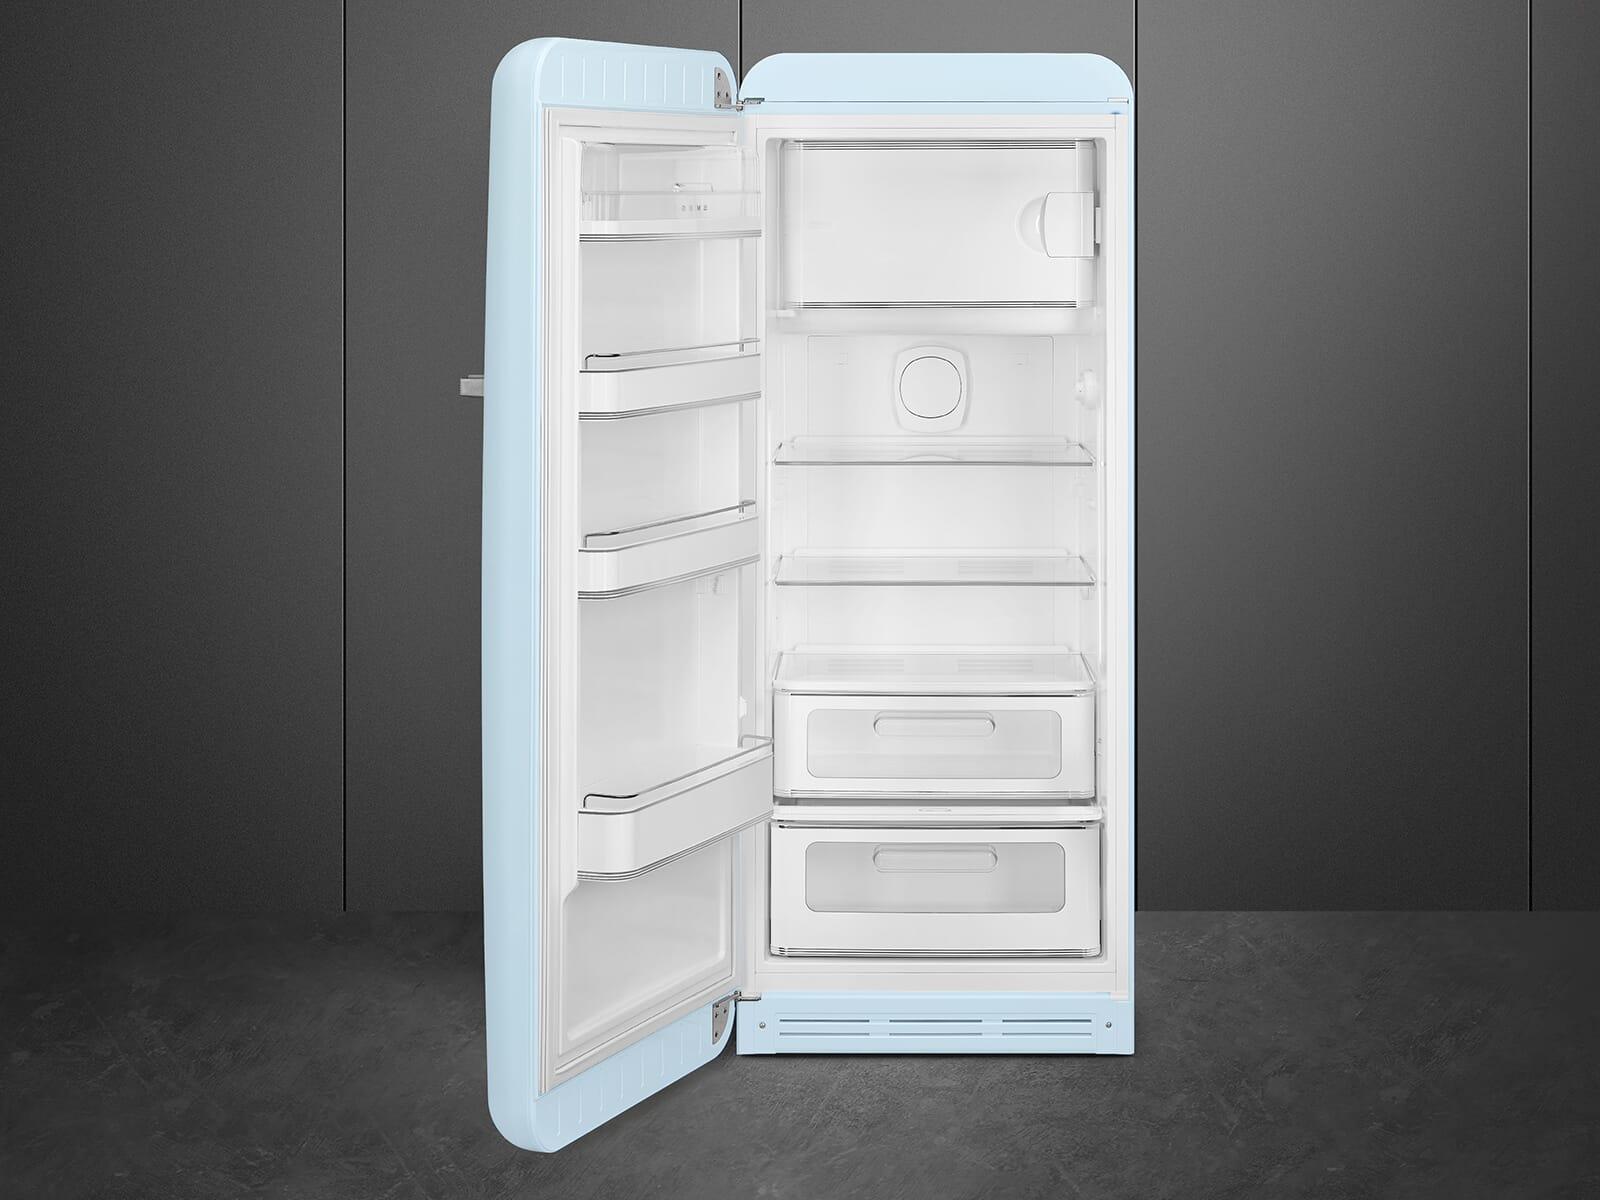 Smeg FAB28LPB3 Standkühlschrank Pastellblau